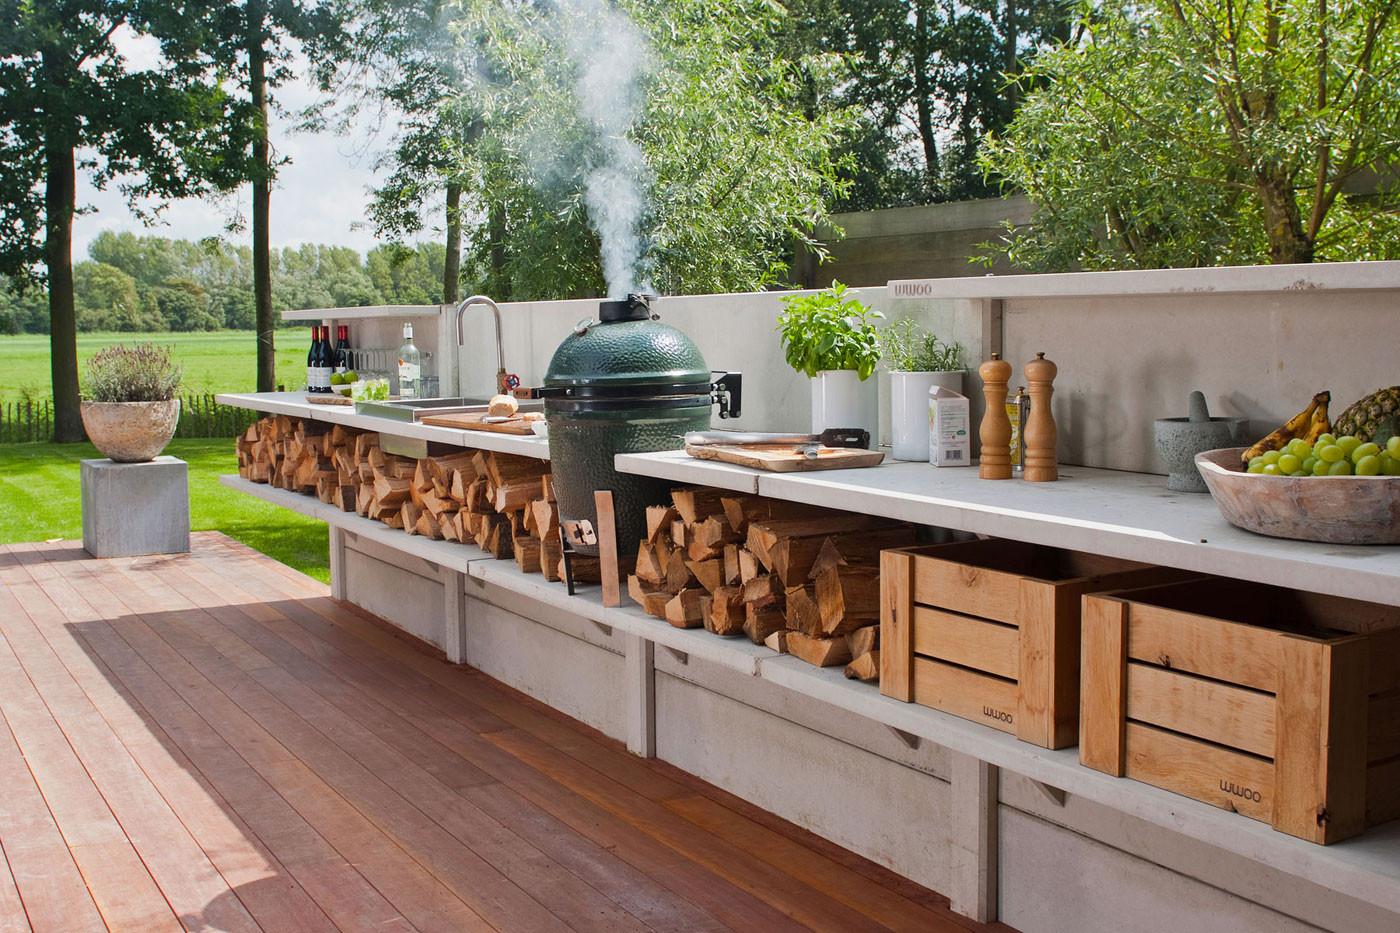 Outdoor Kitchen Diy  15 Outdoor Kitchen Designs That You Can Help DIY